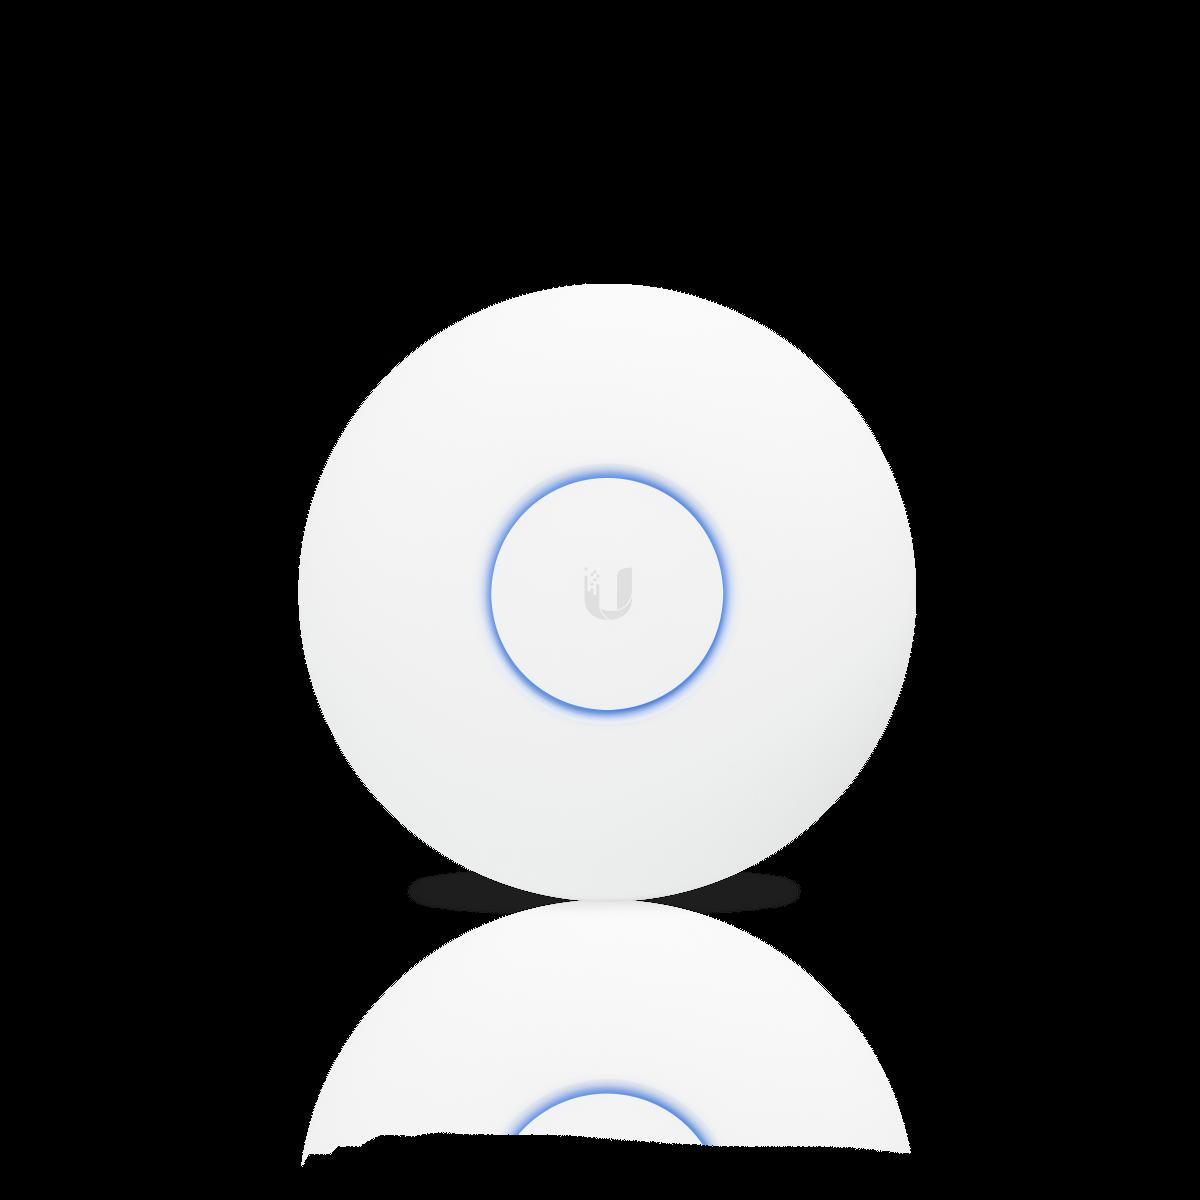 Ubiquiti UniFi Access Point, U6-LITE, WLAN